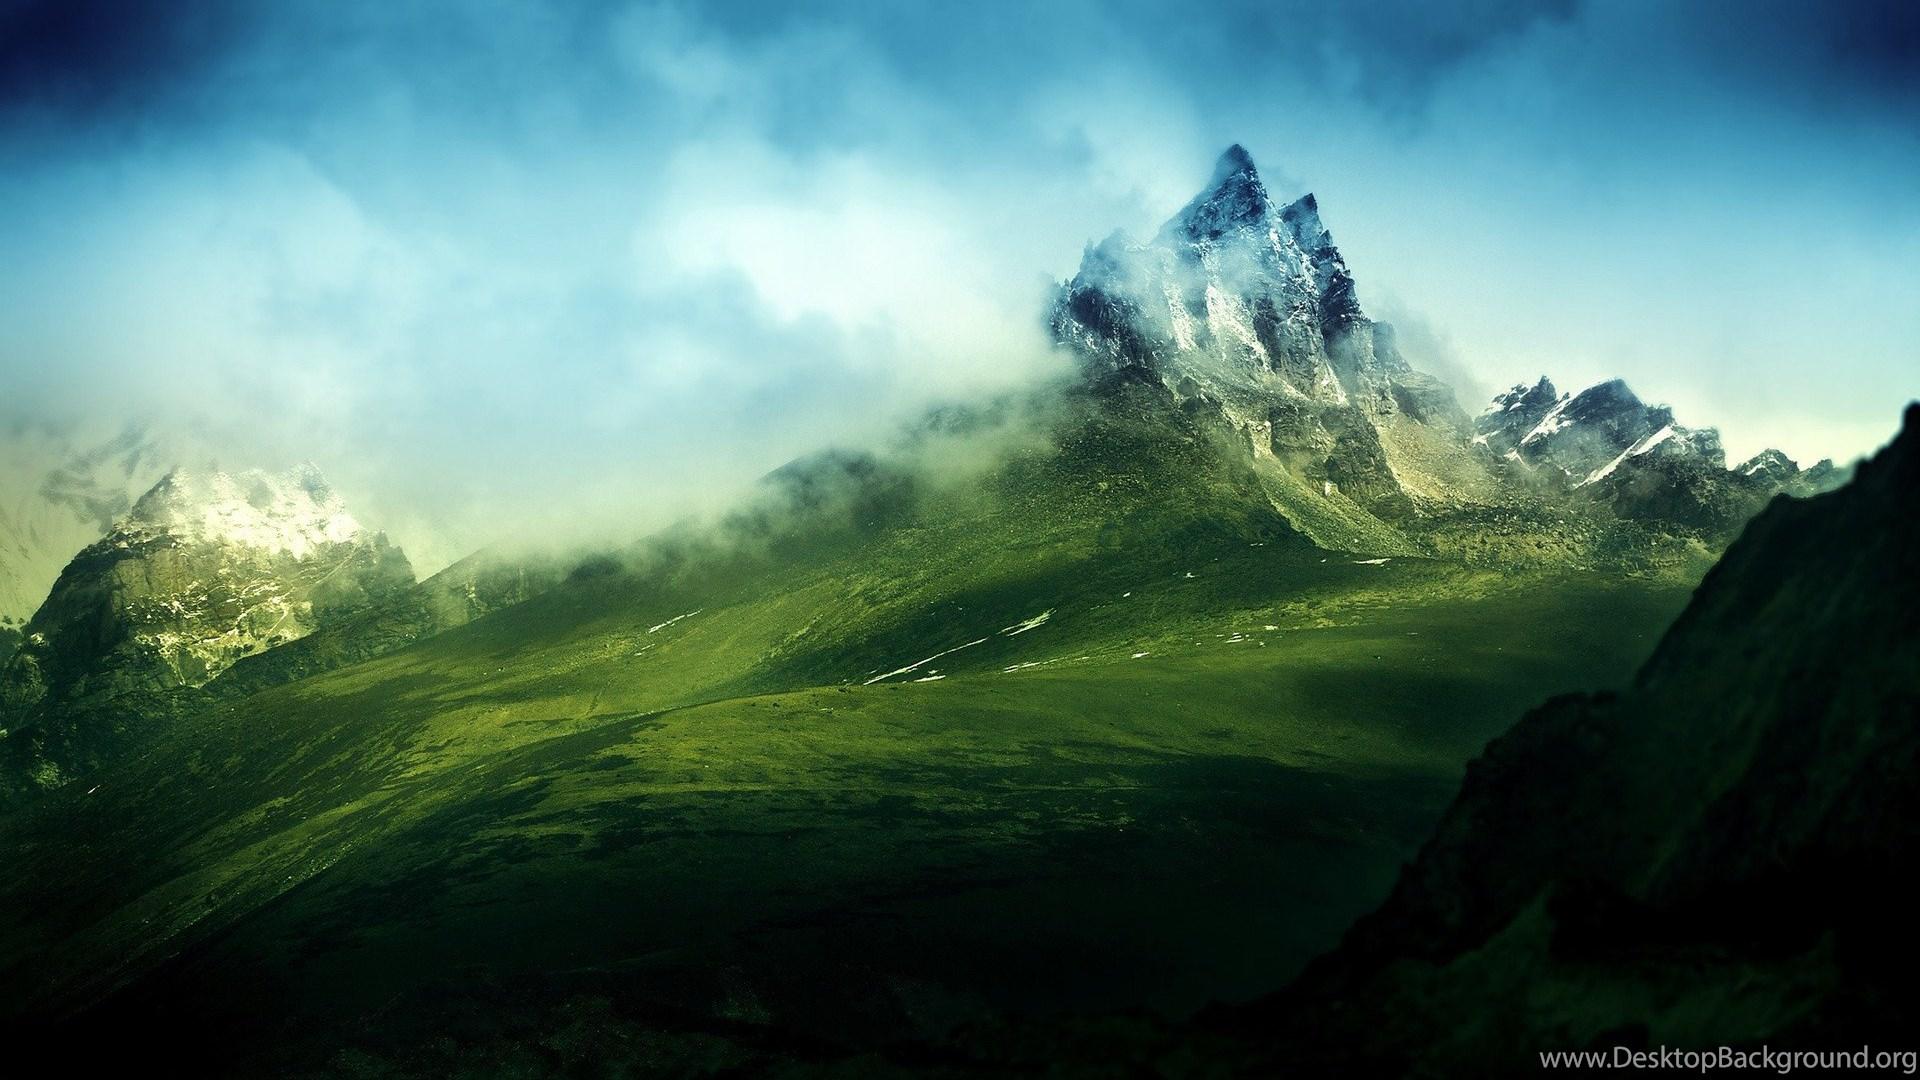 Himalaya mountains wallpapers cool wallpapers hd 1080p - Himalaya pictures wallpaper ...